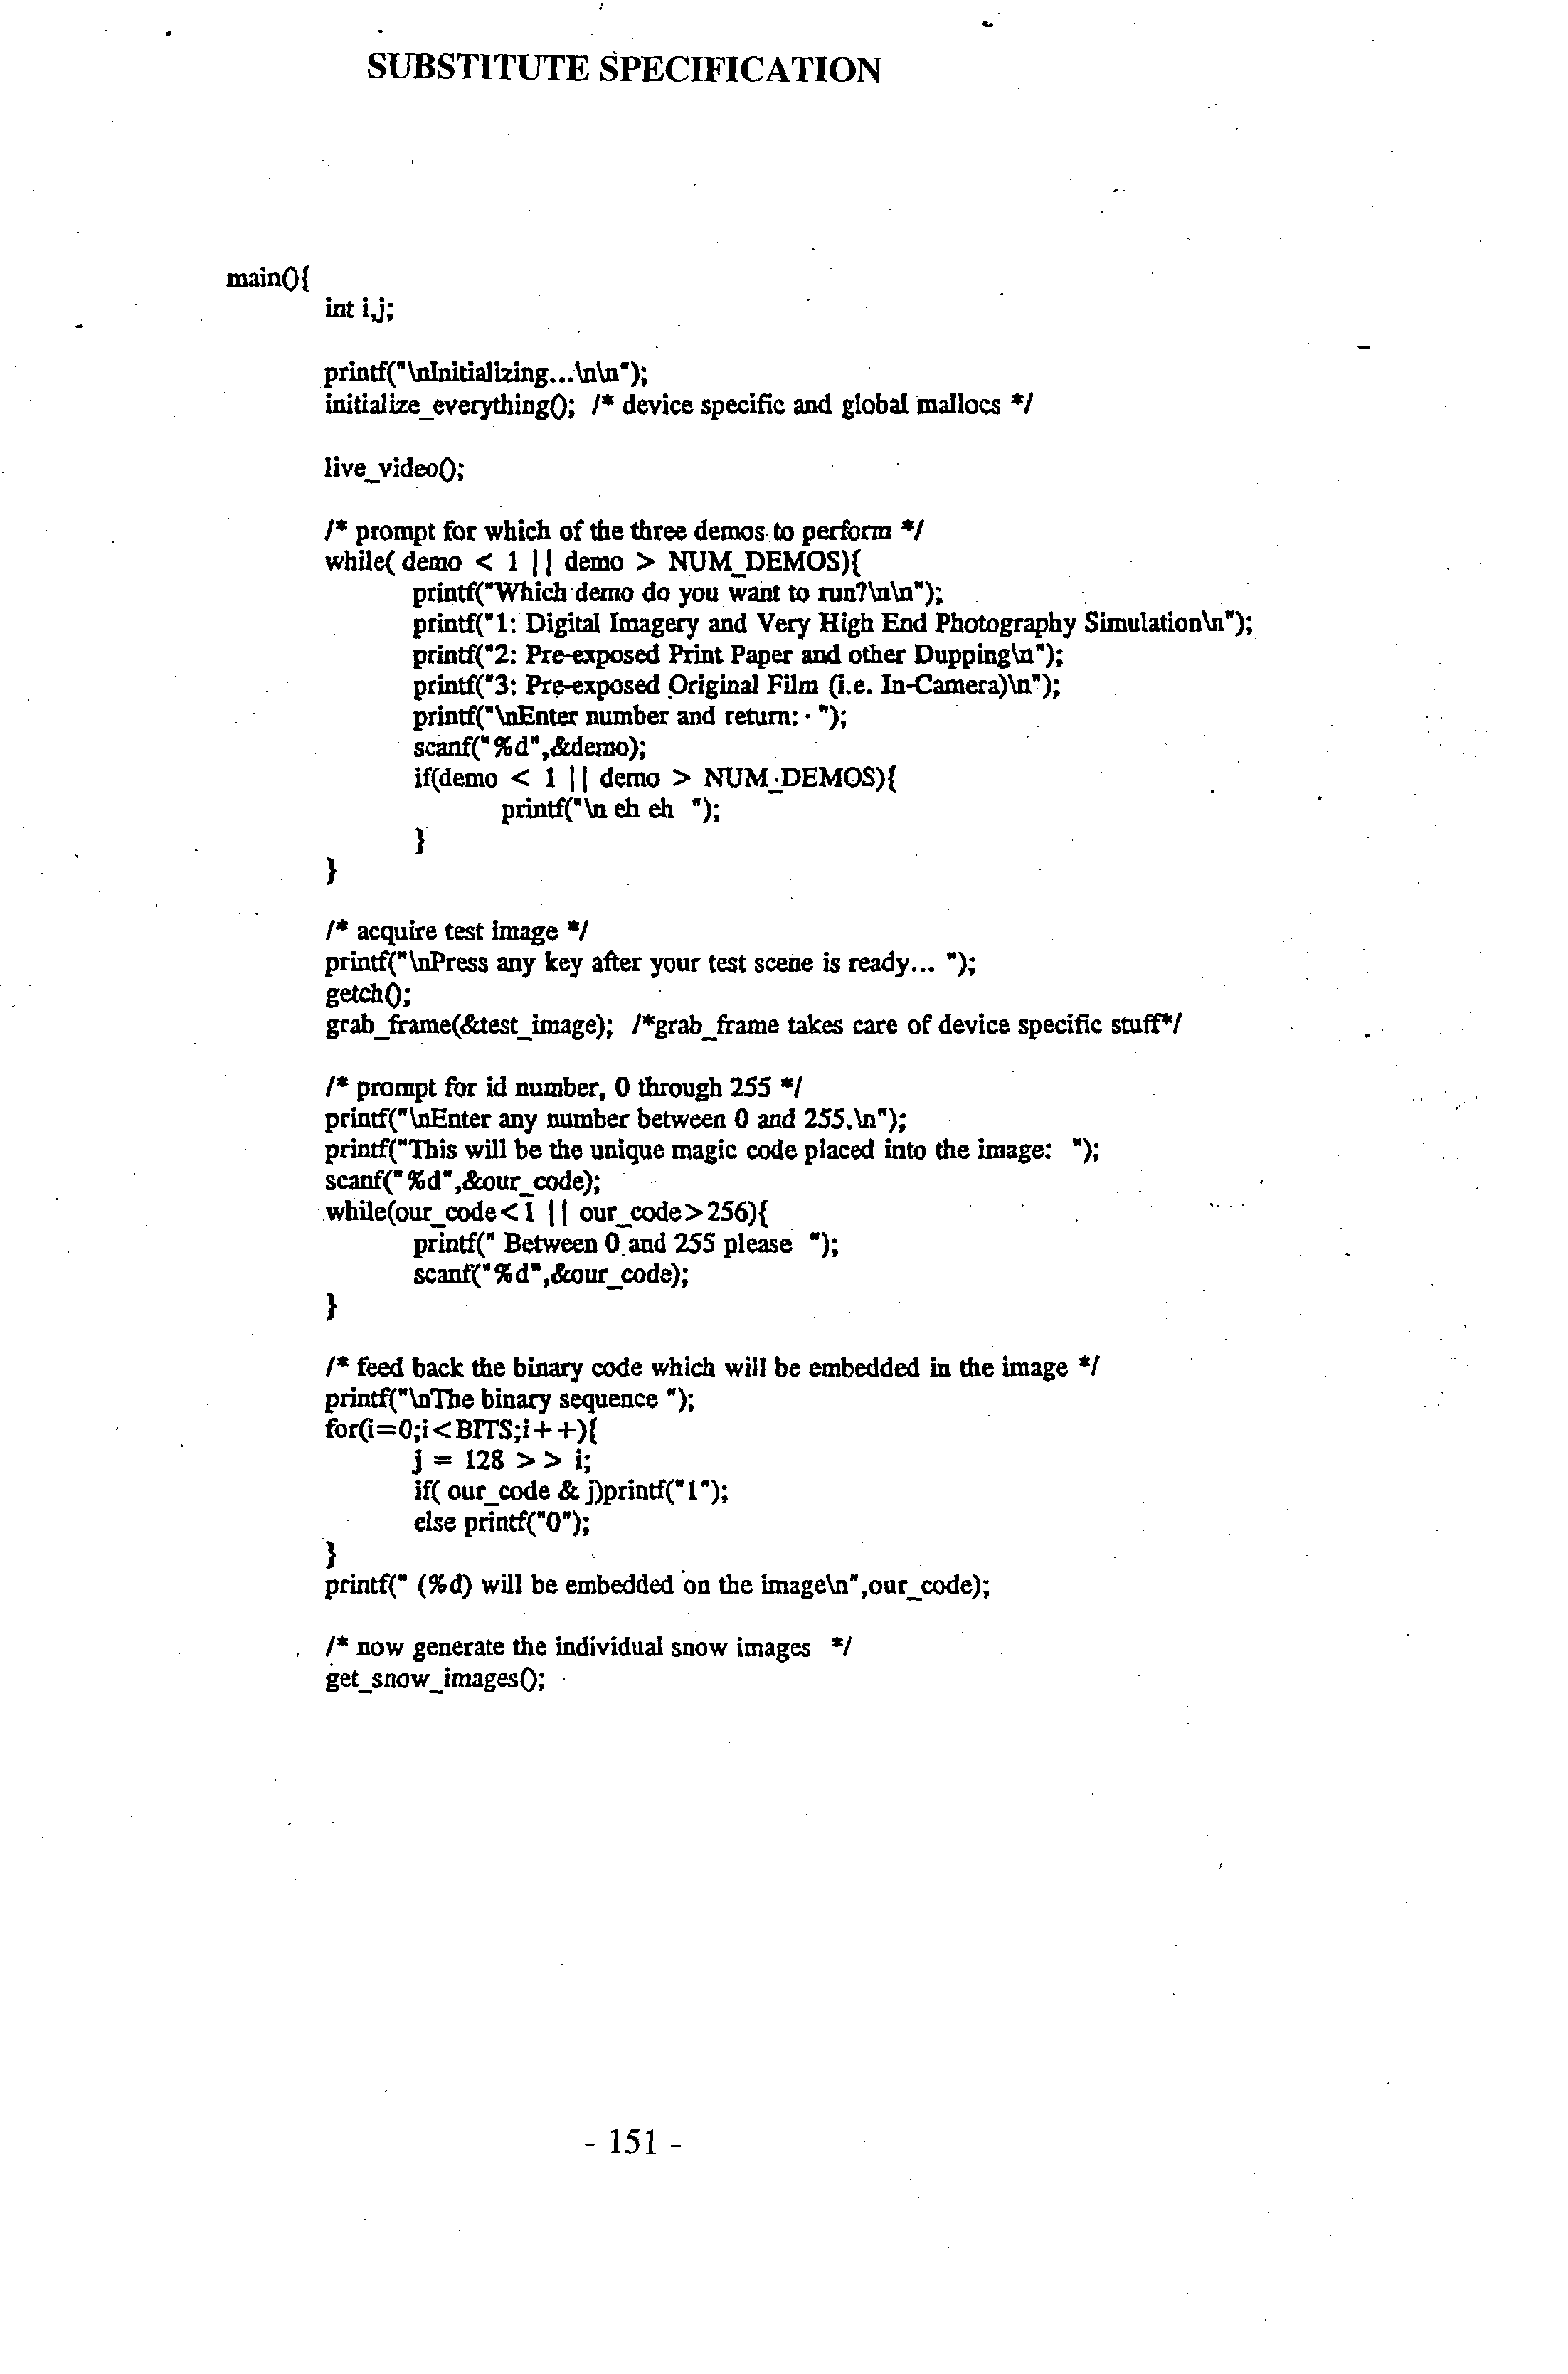 US20030091189A1 - Arrangement for embedding subliminal data in